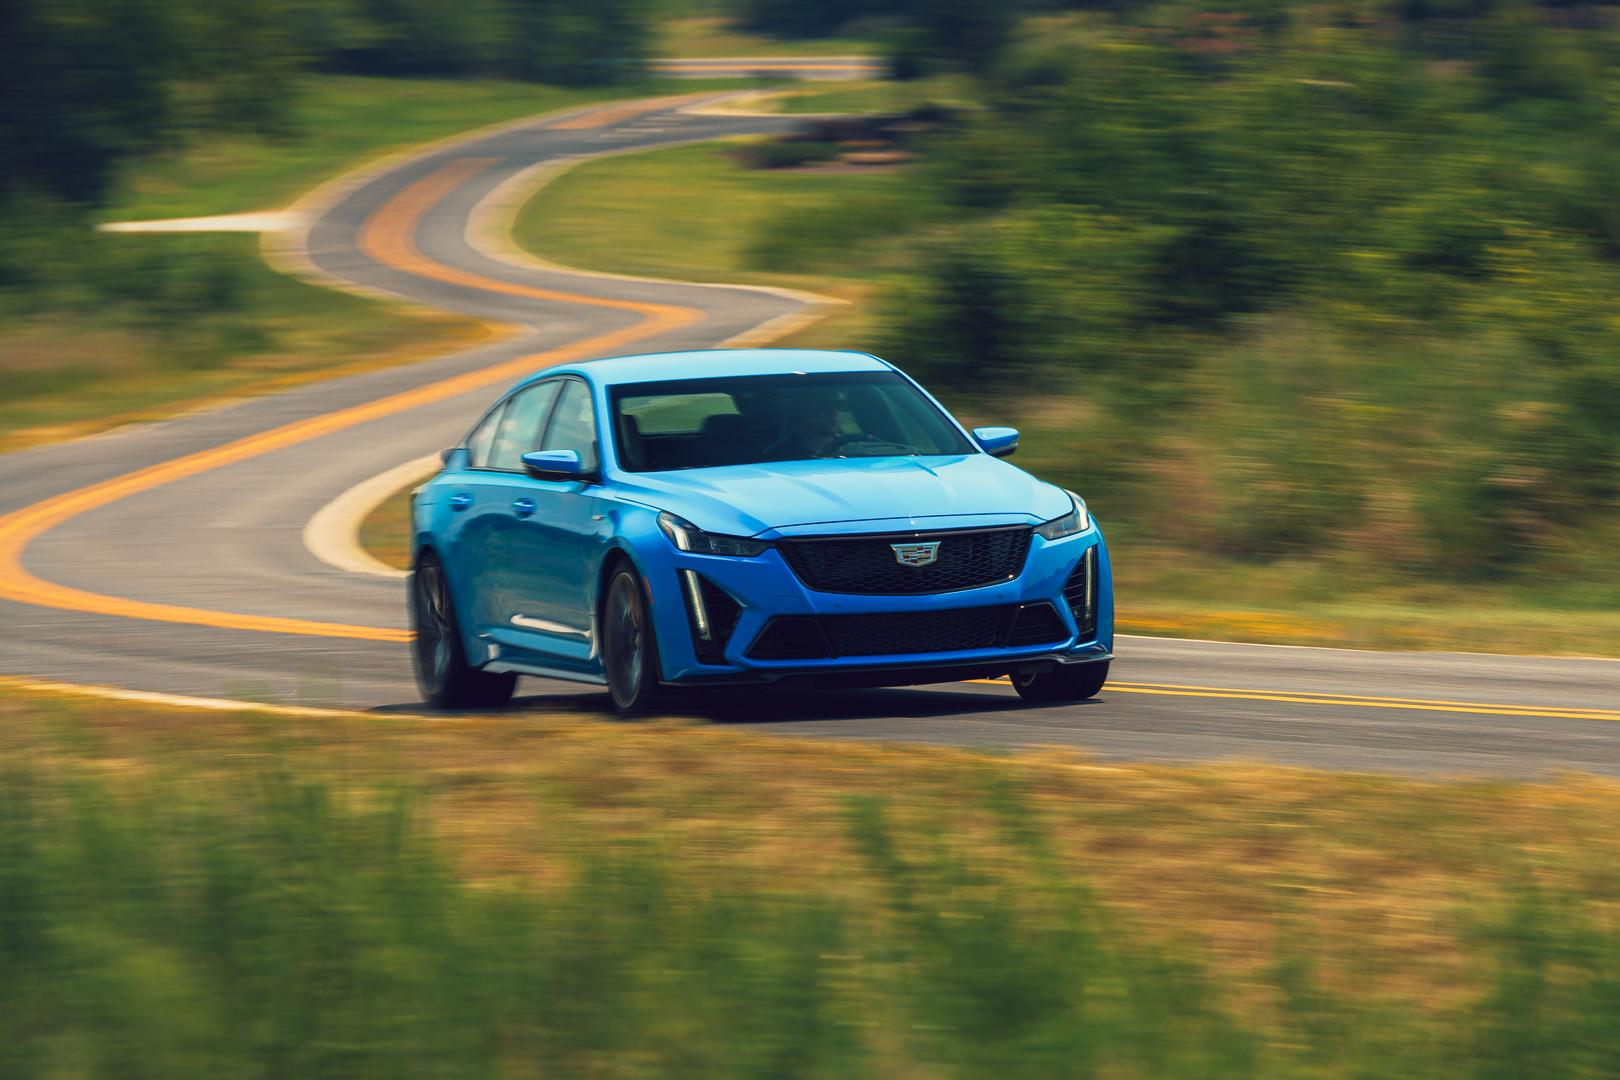 2022 Cadillac CTS-V Blackwing review